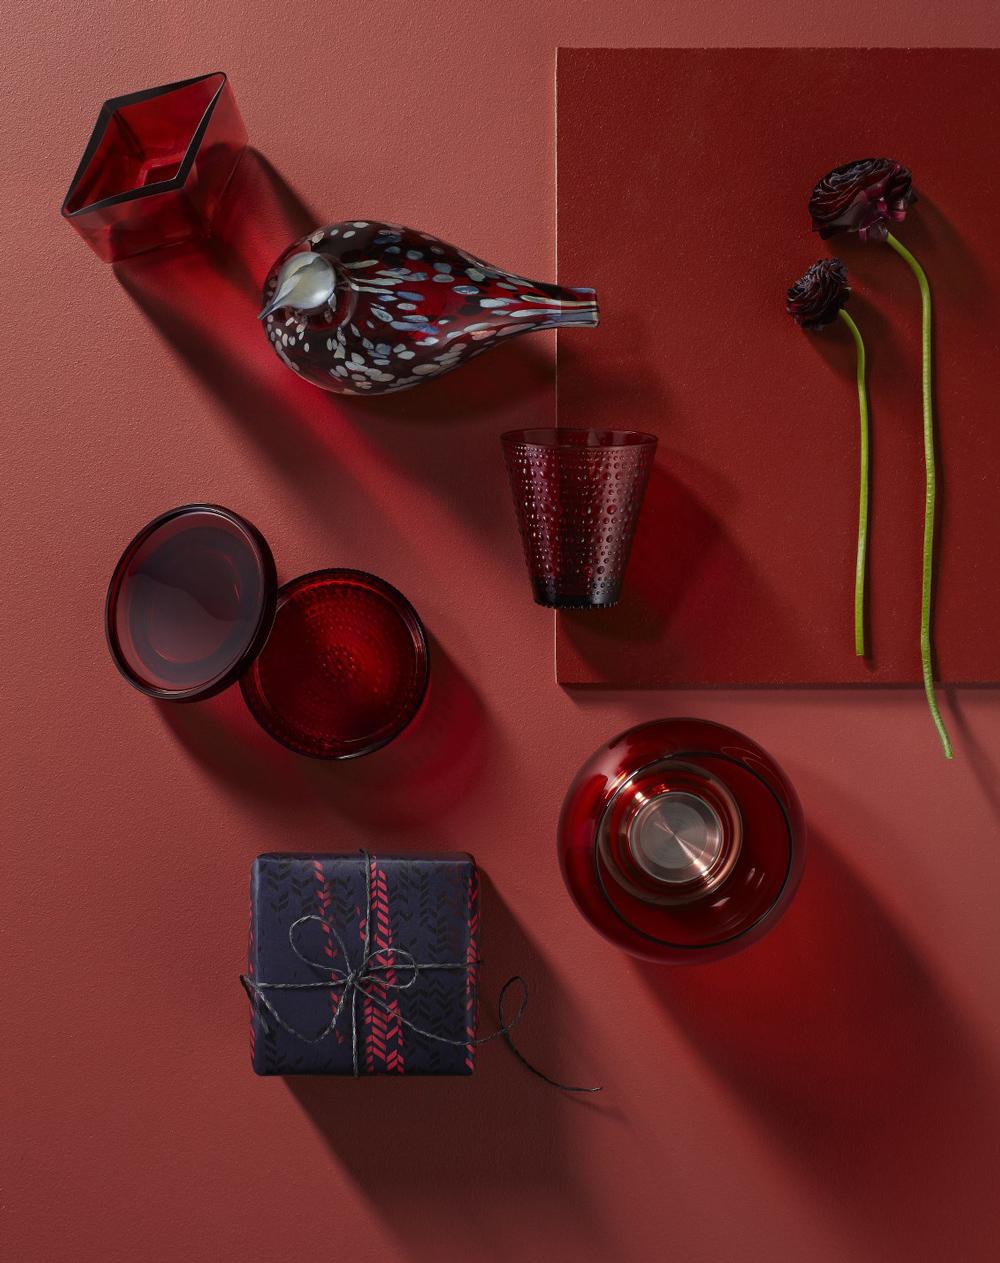 Iittala-Xmas-2016-gifting-red_JPG